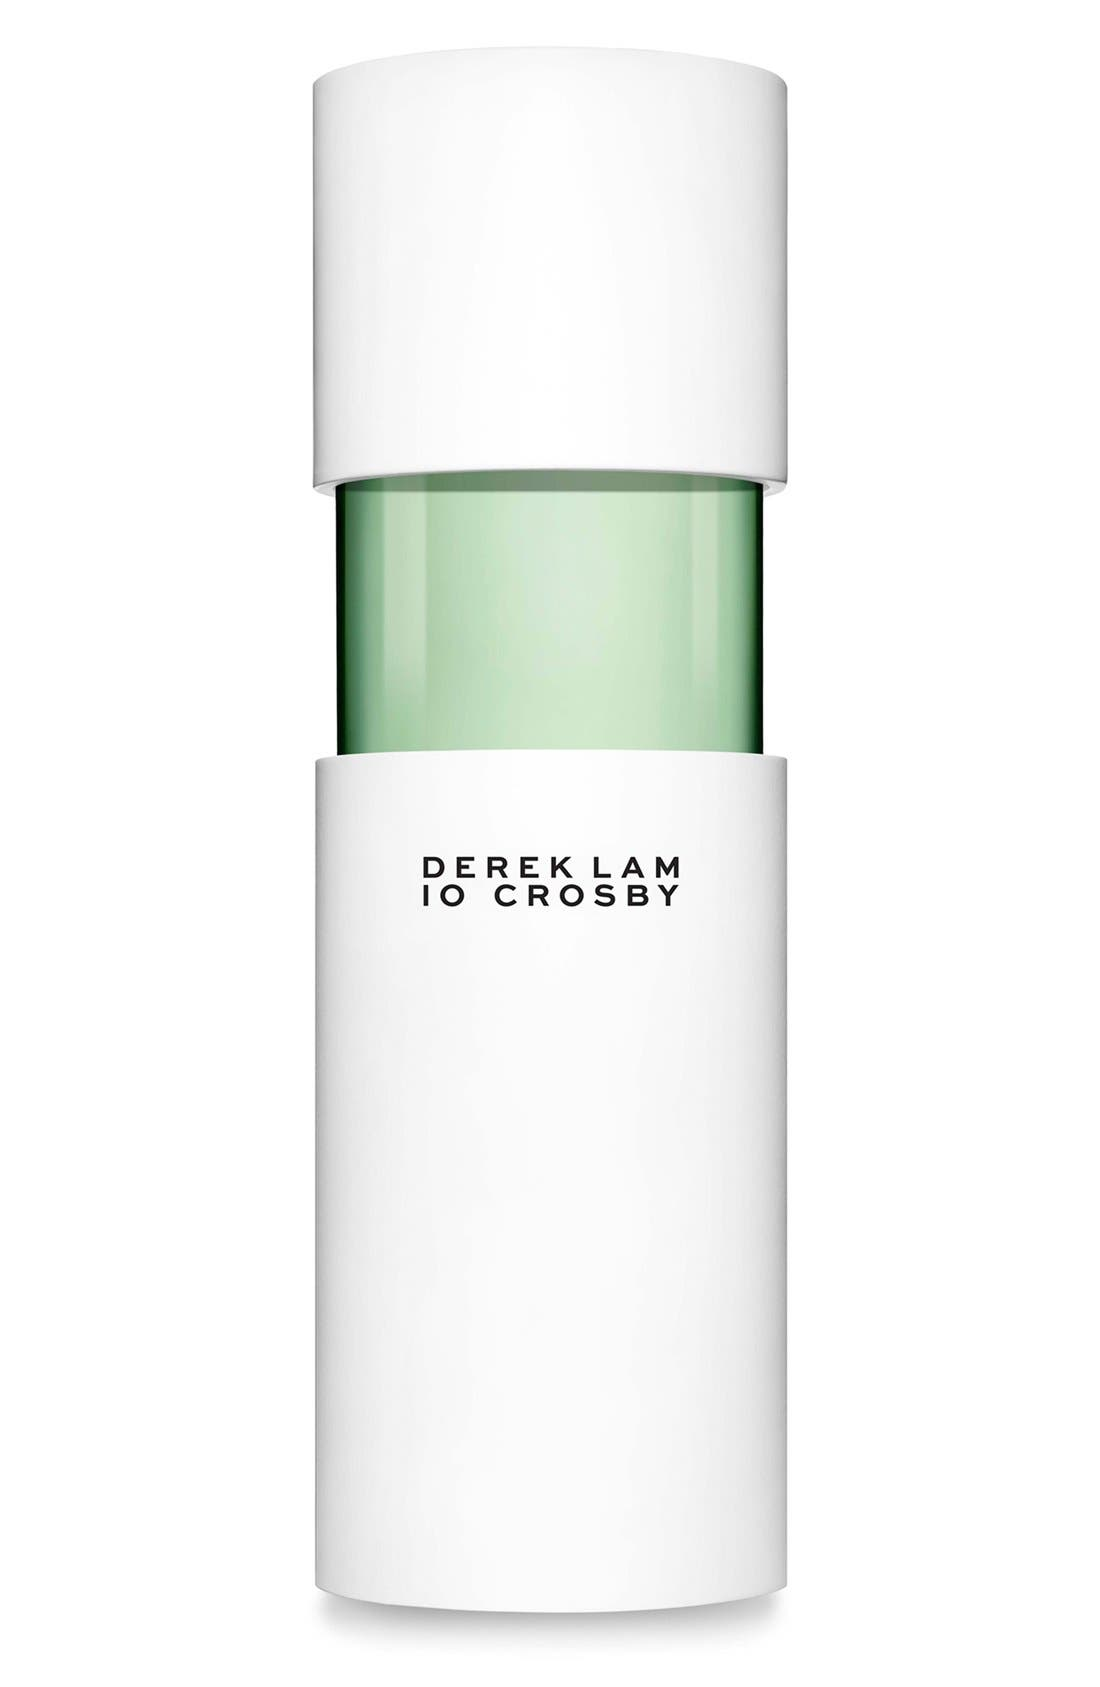 Derek Lam 10 Crosby 'Rain Day' Eau de Parfum